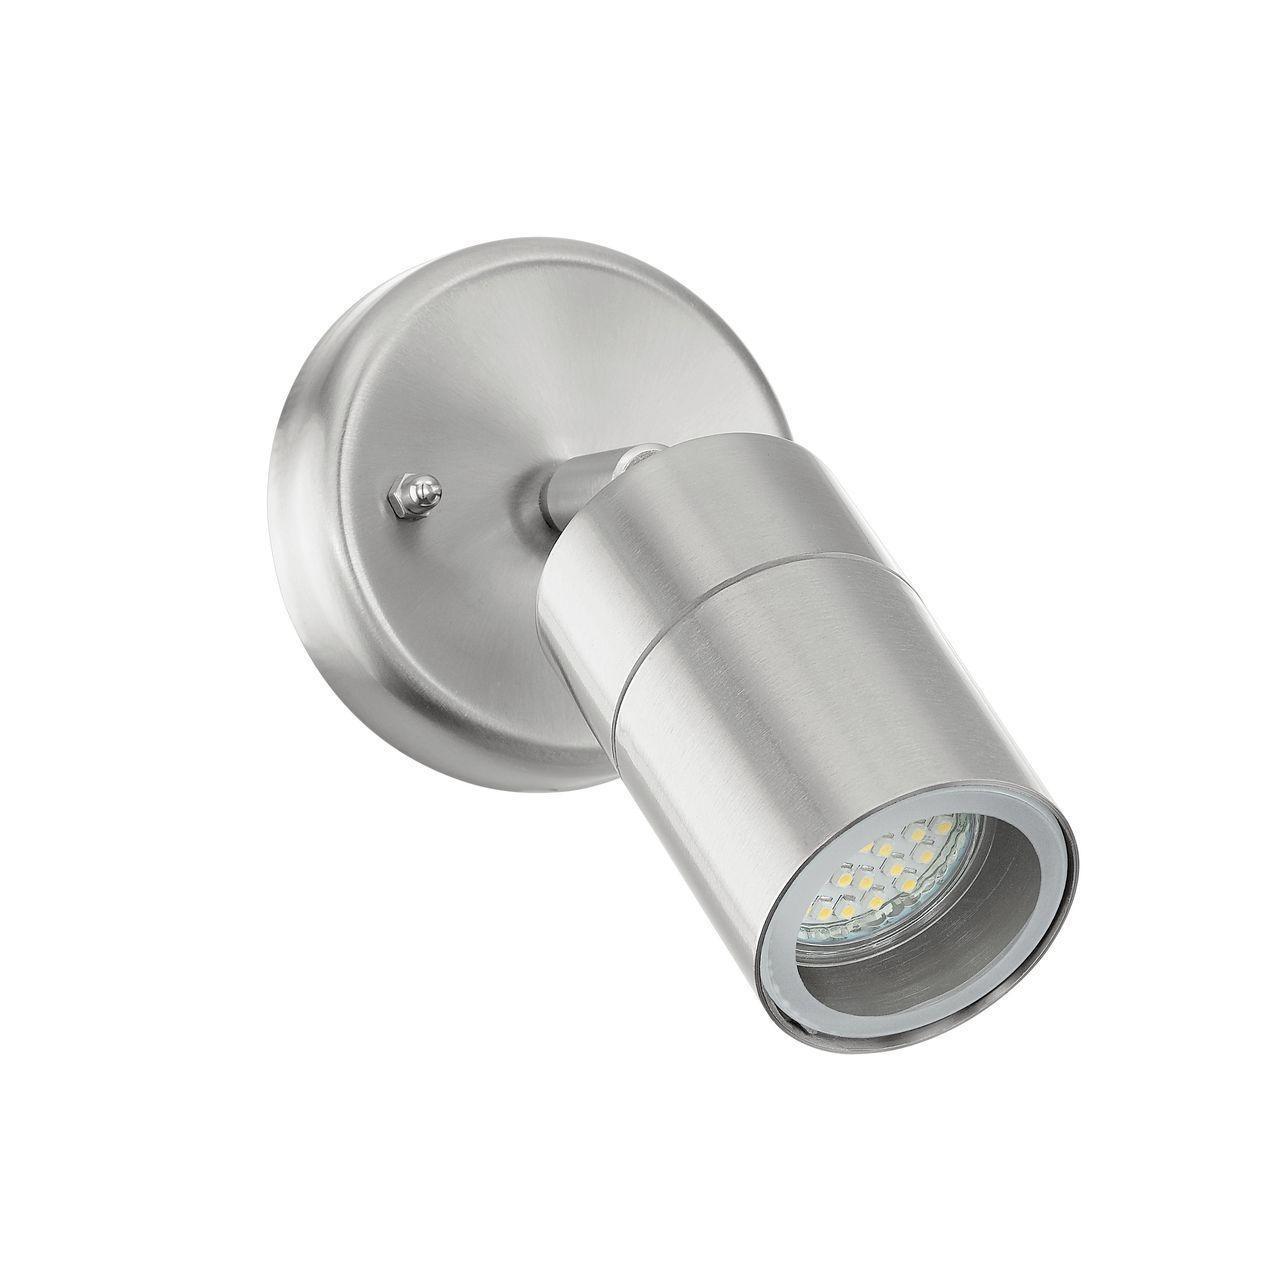 Уличный светильник Eglo 93268, серый eglo 93175